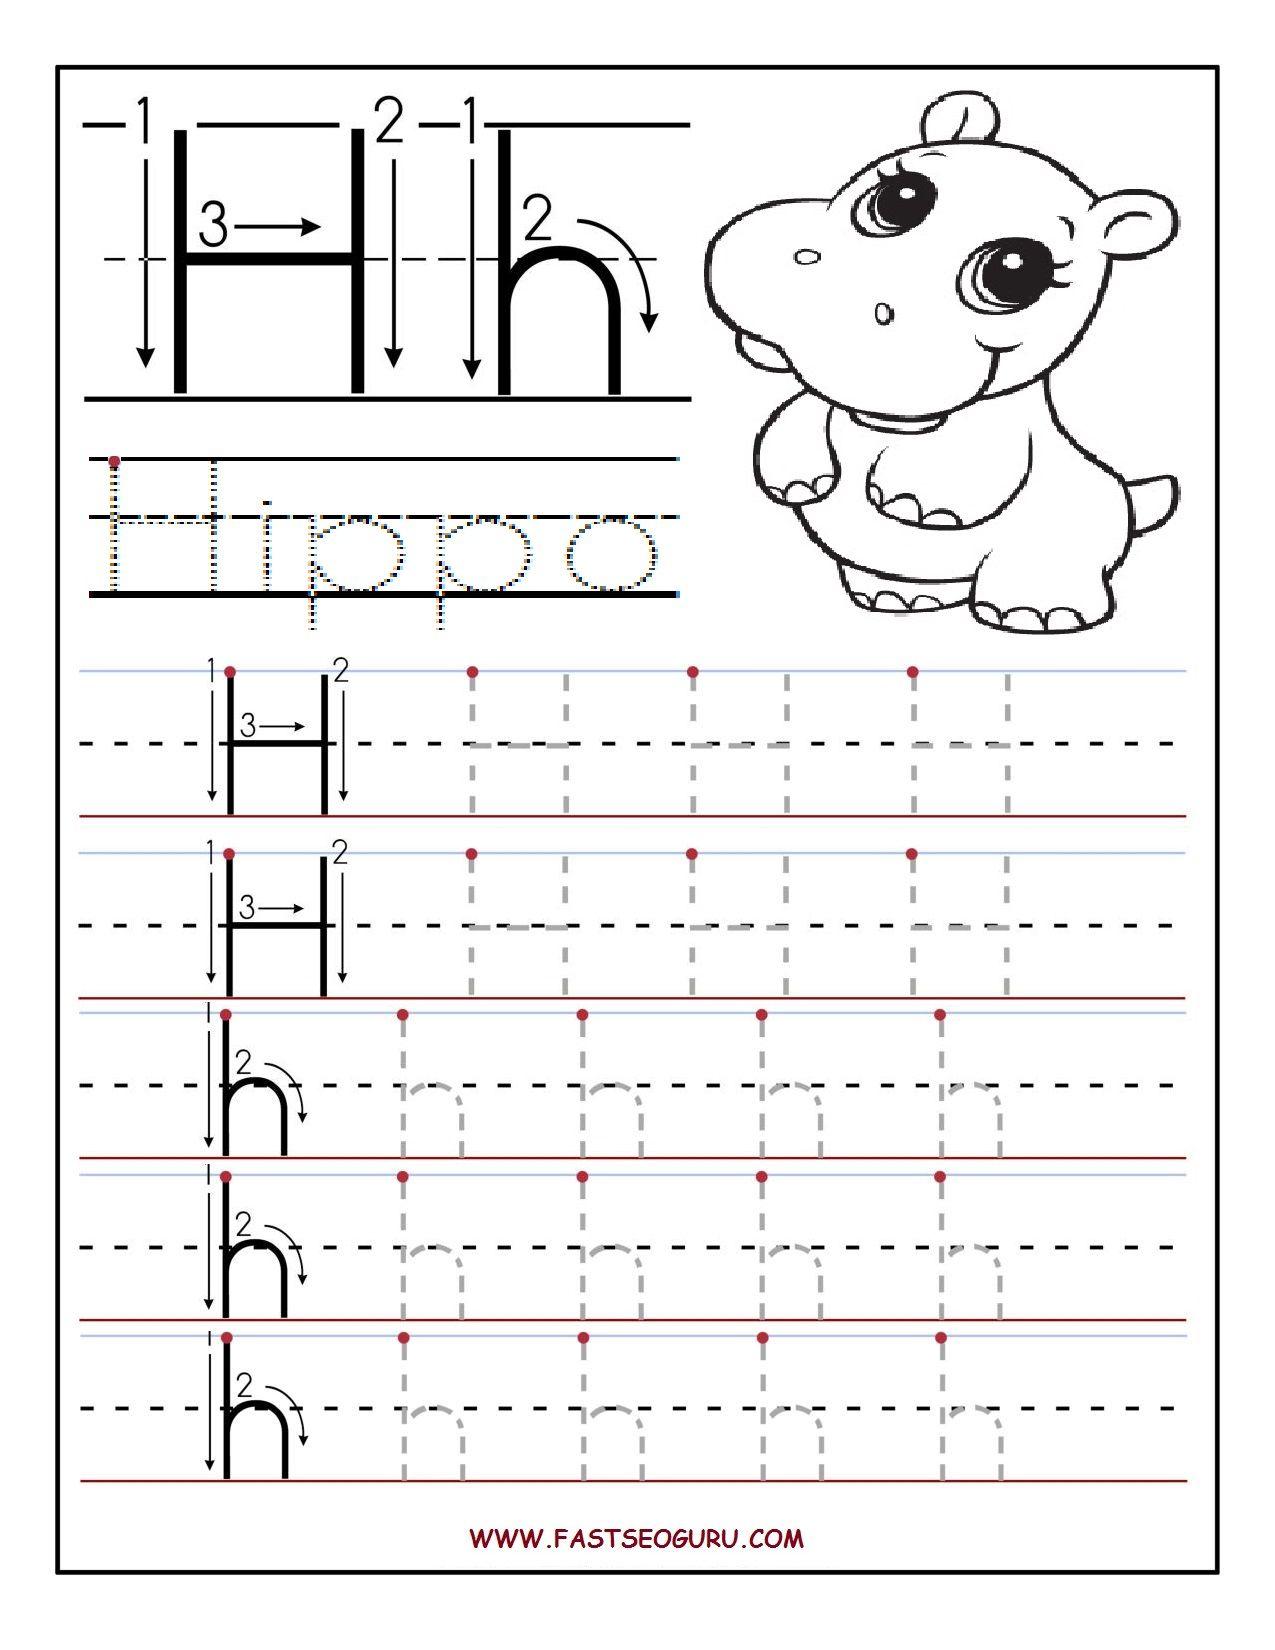 Tracing Letter H Worksheets Preschoolers